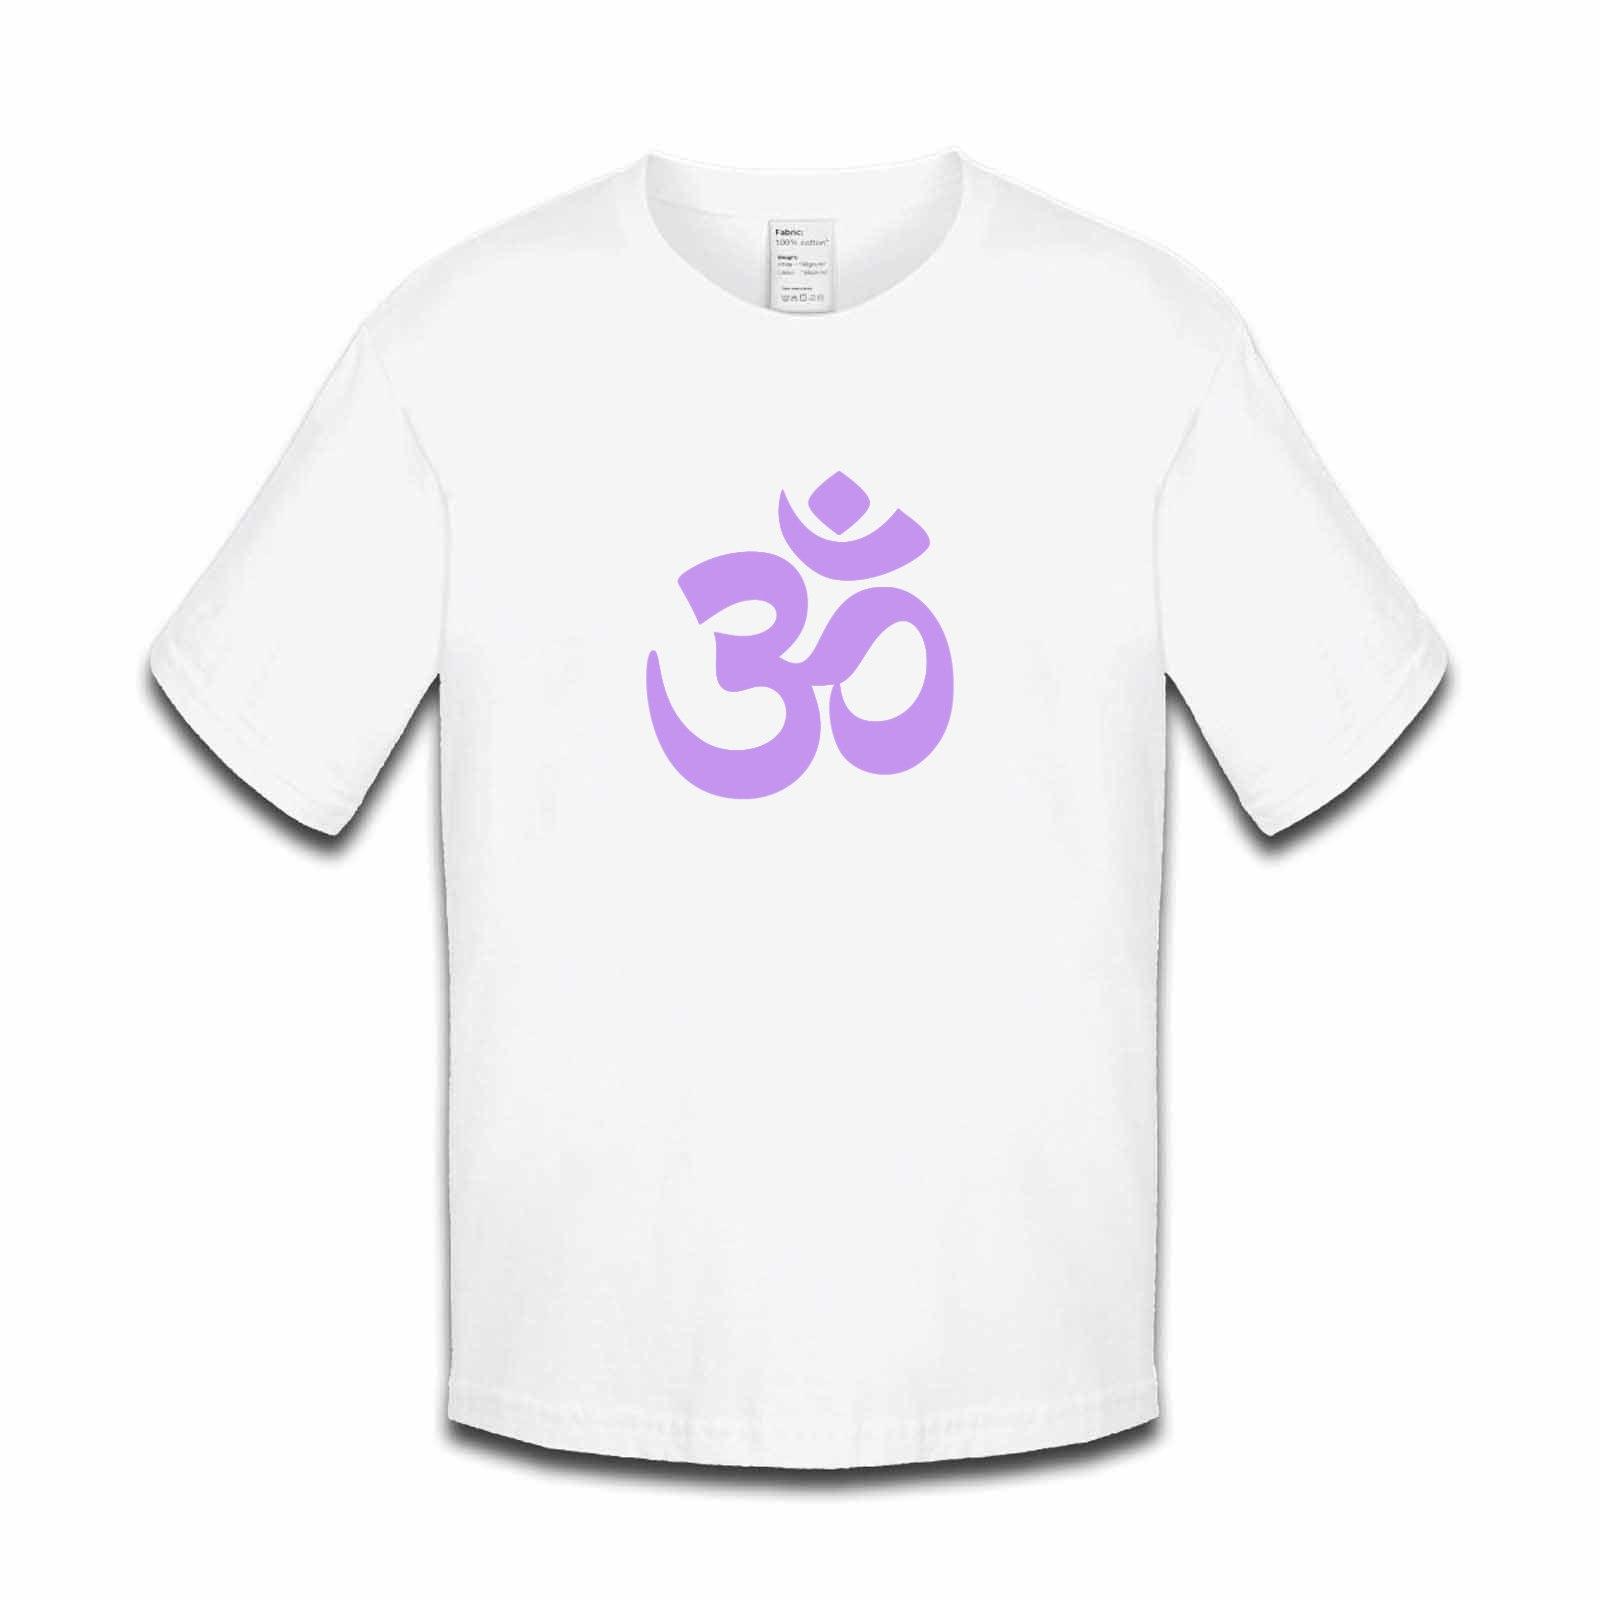 Namaste symbol emoji image collections symbol and sign ideas om emoji symbol choice image symbol and sign ideas emoji om symbol girls tshirt available in buycottarizona